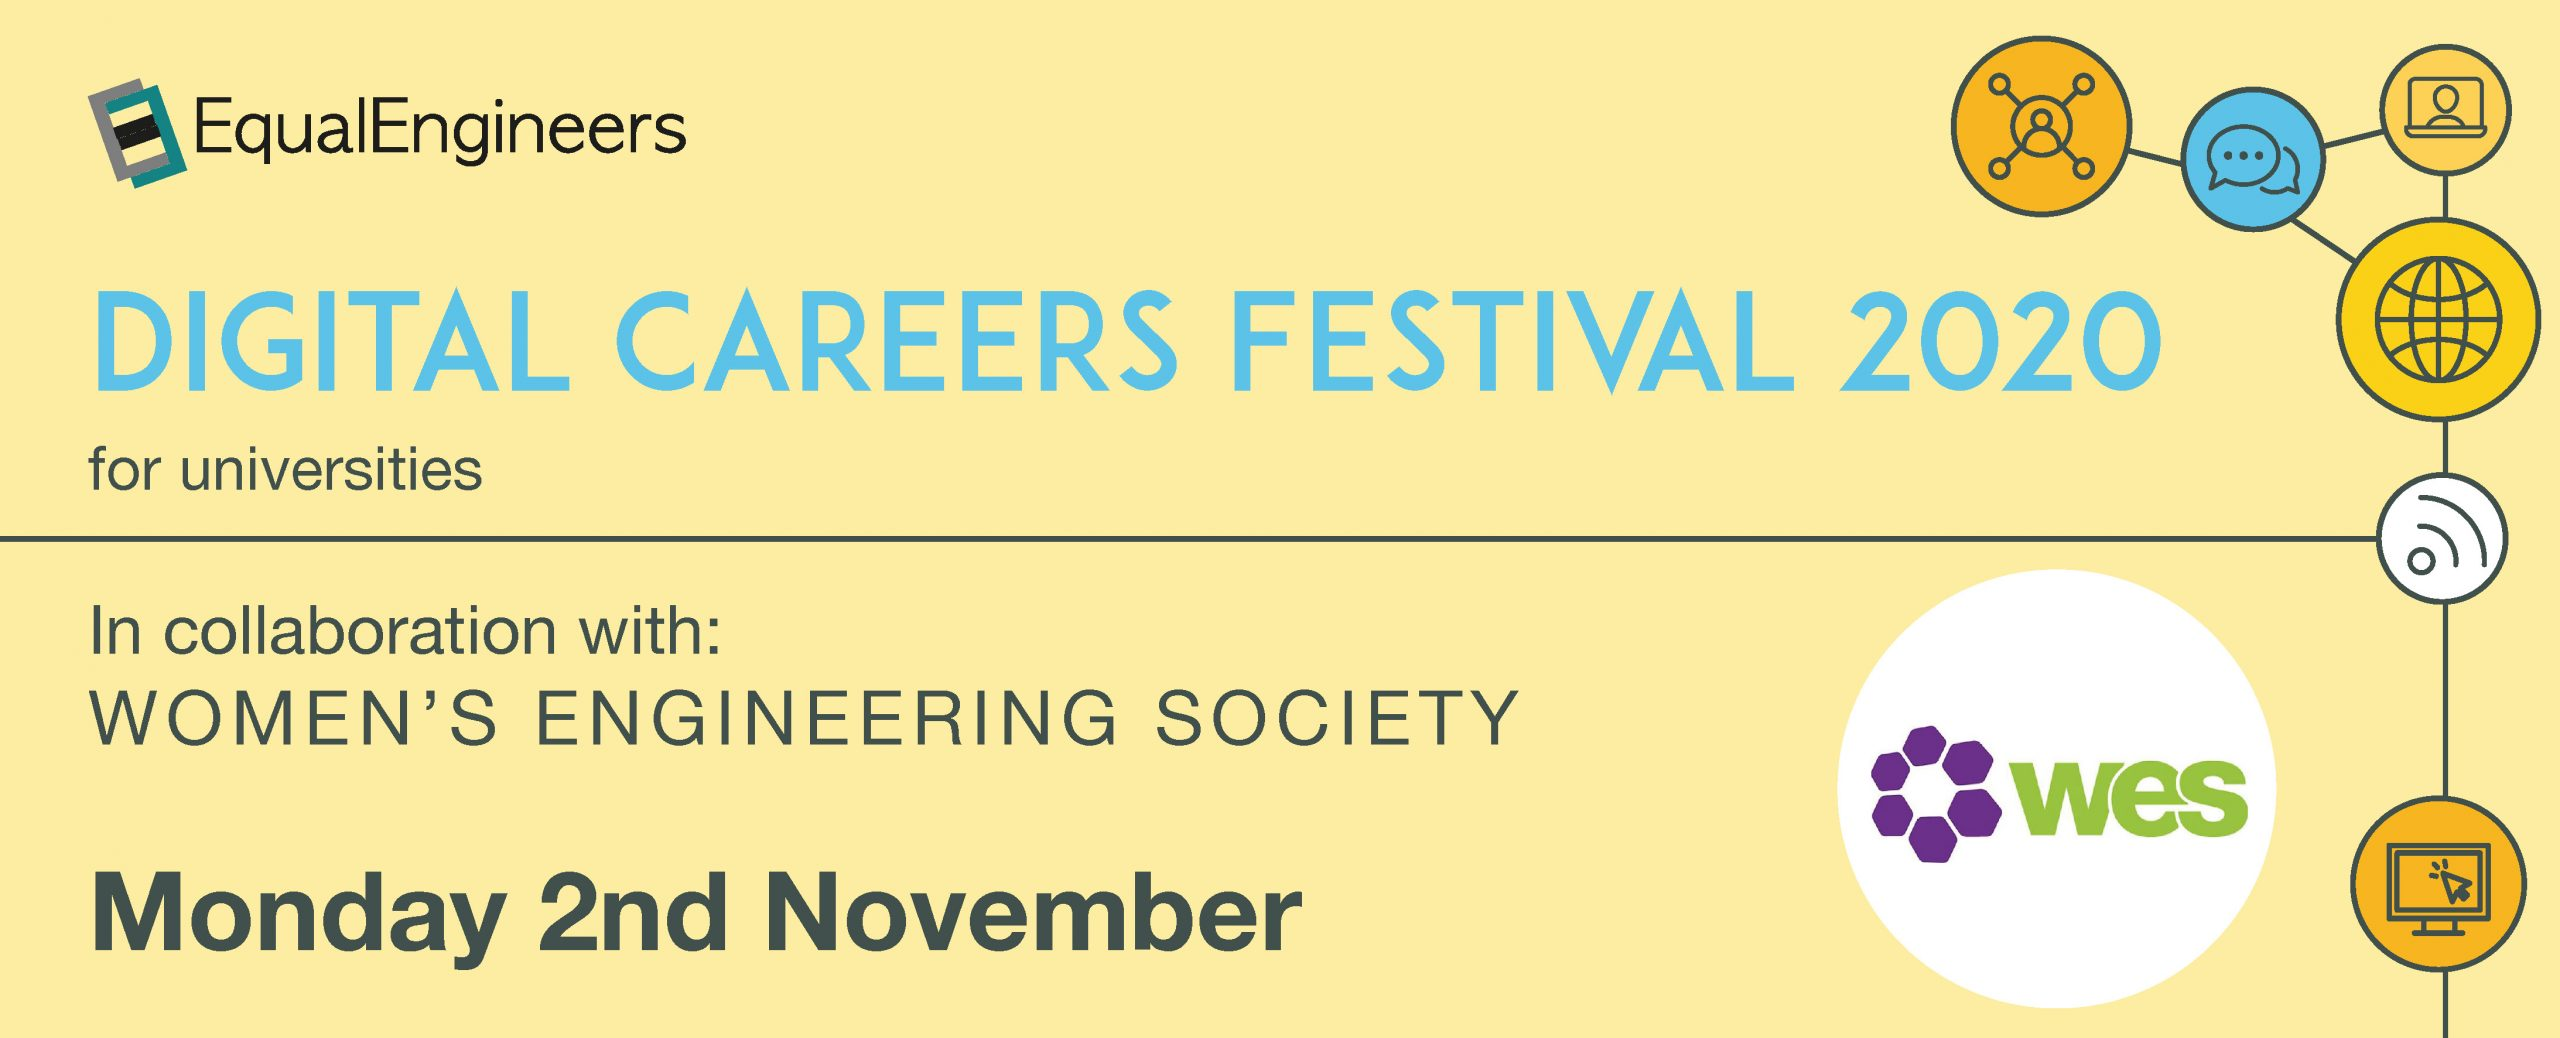 Digital Careers Festival for Universities - 2nd November